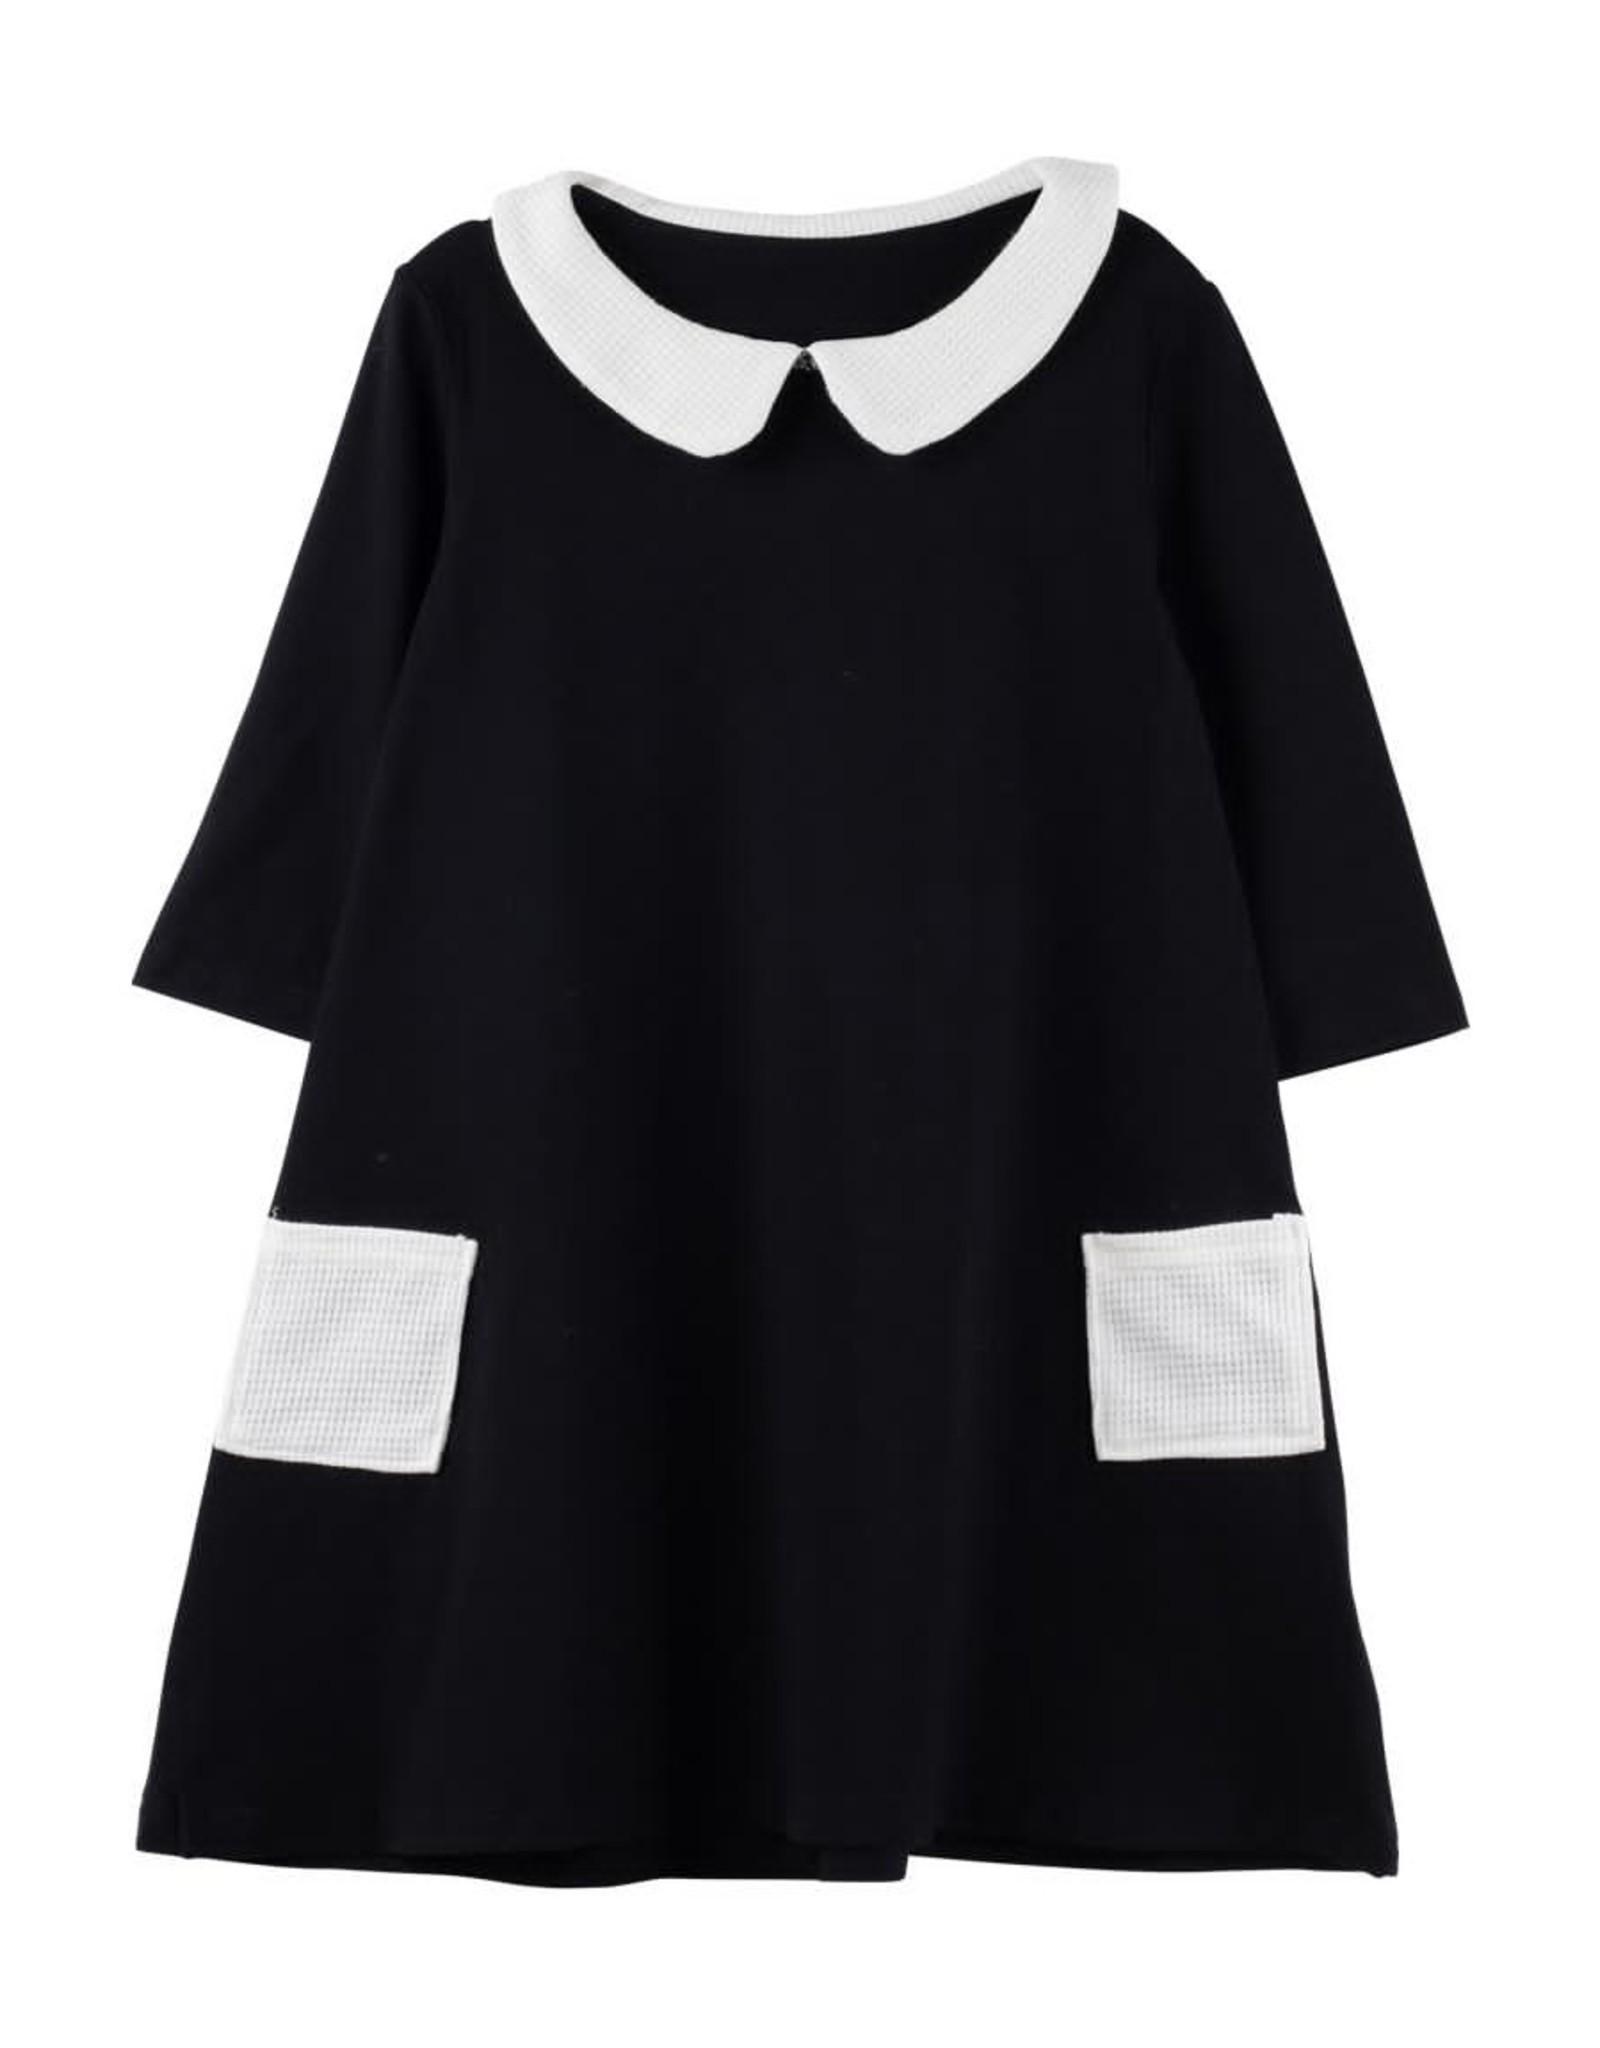 Bon Rever Bon Rever Waffle Collar and Pockets 3/4 Sleeve Dress